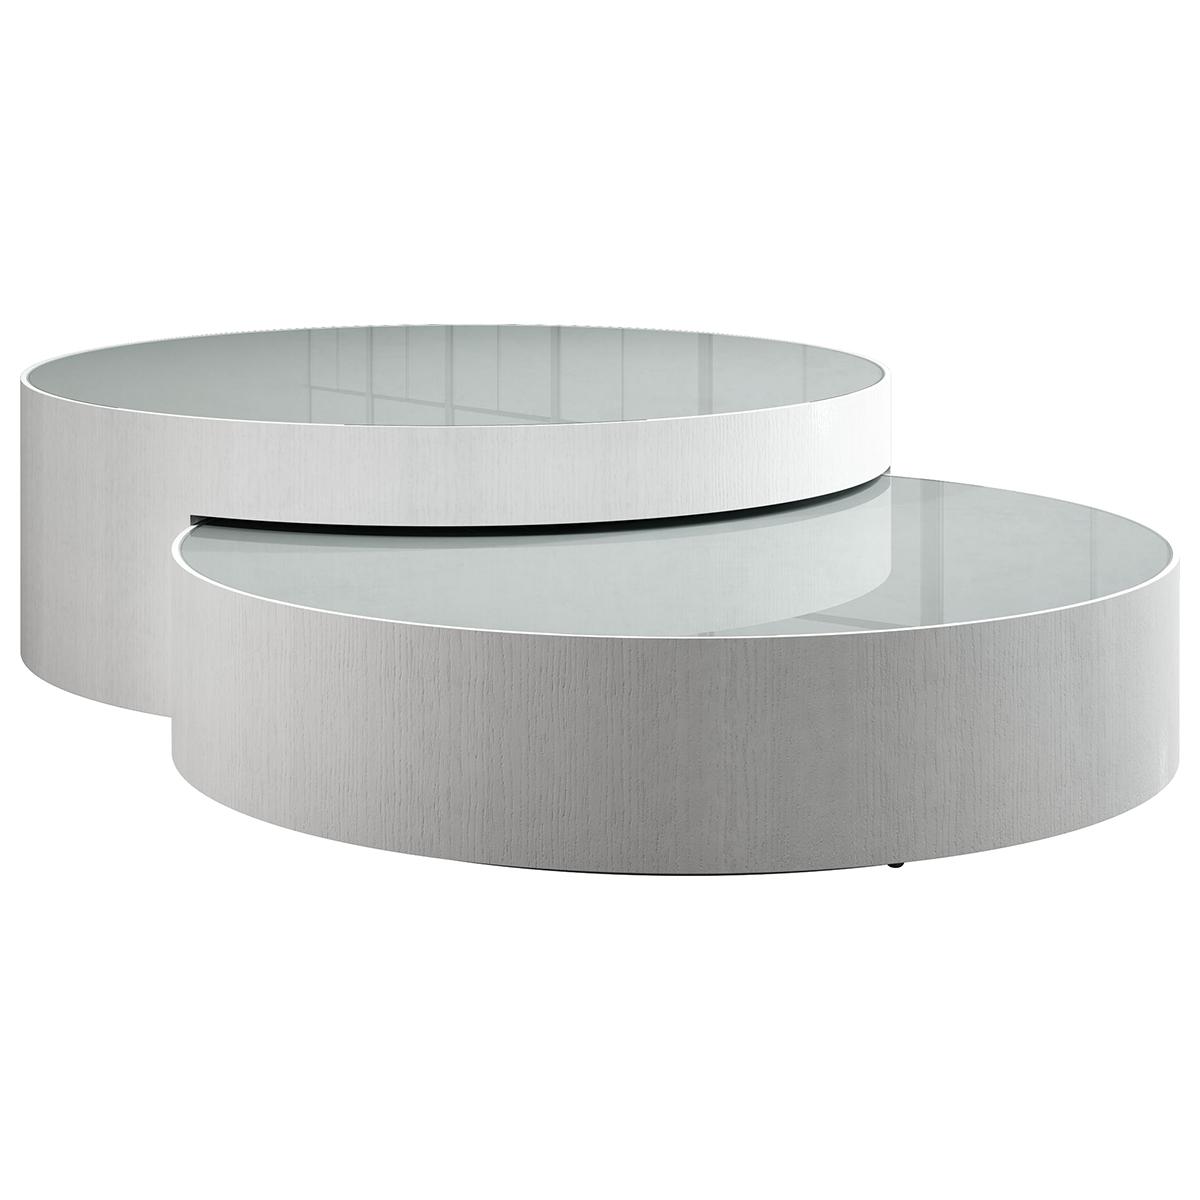 Berkeley Mezzanine Coffee Table Set